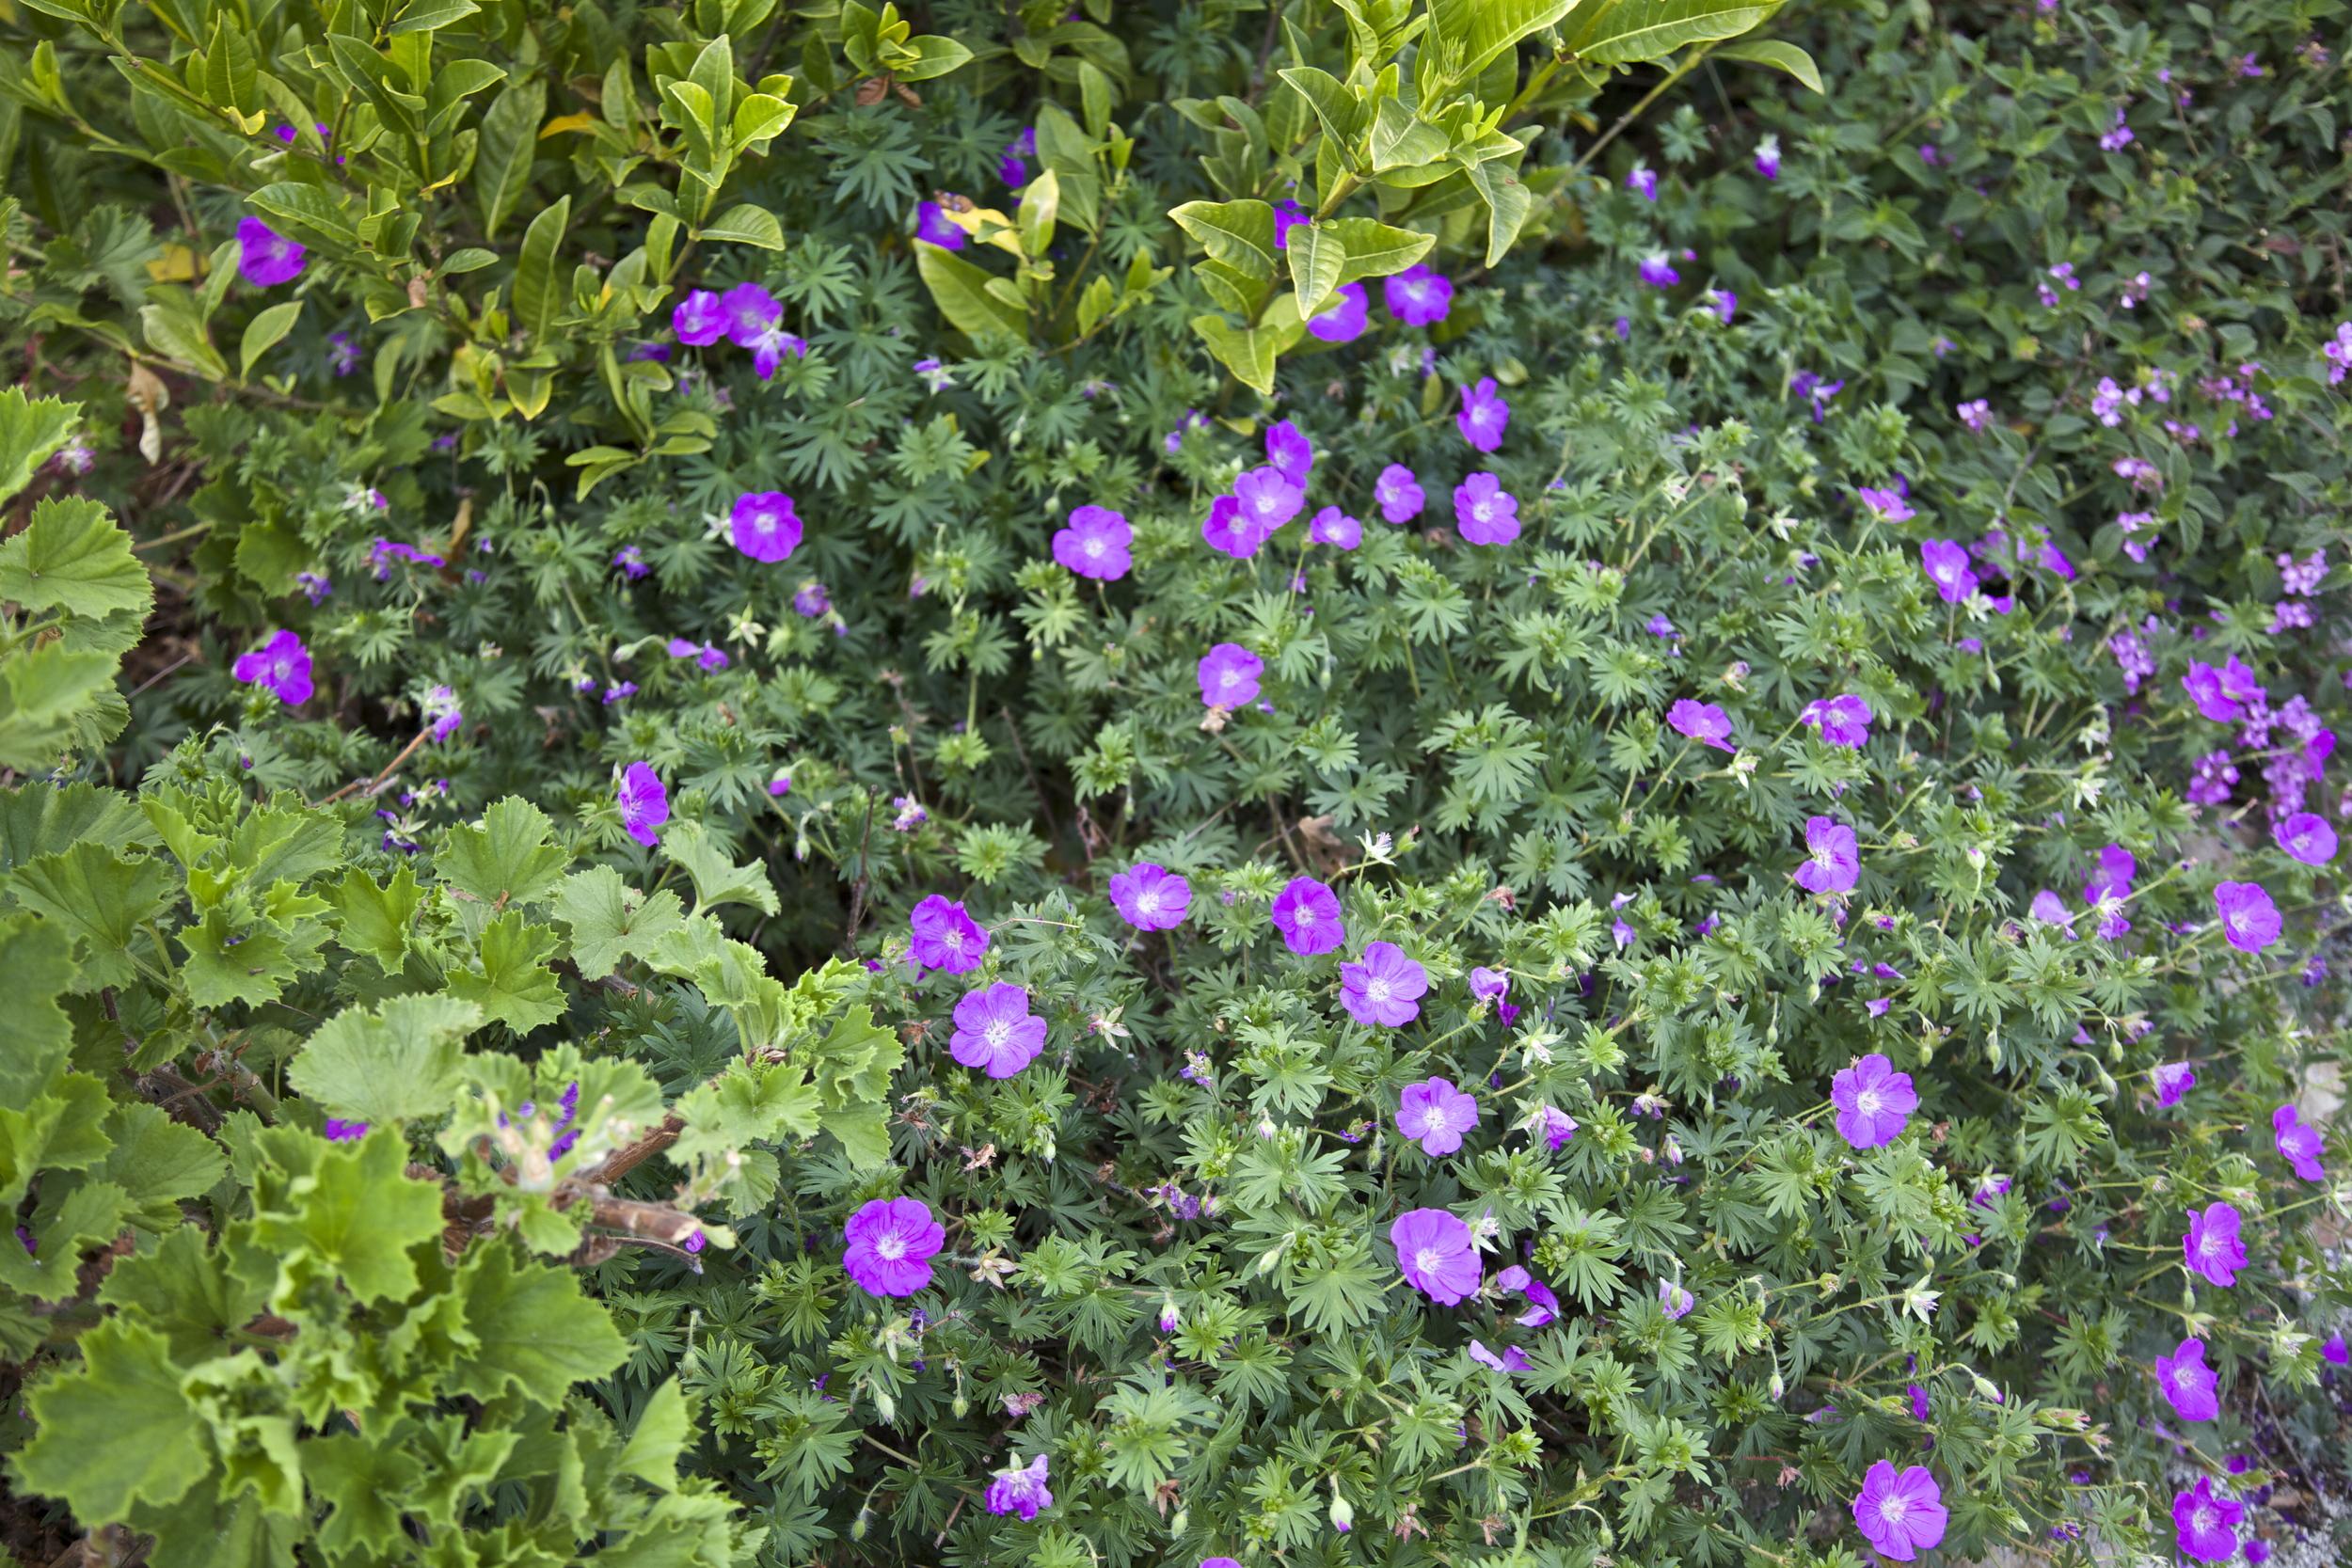 Abundant geranium on paths